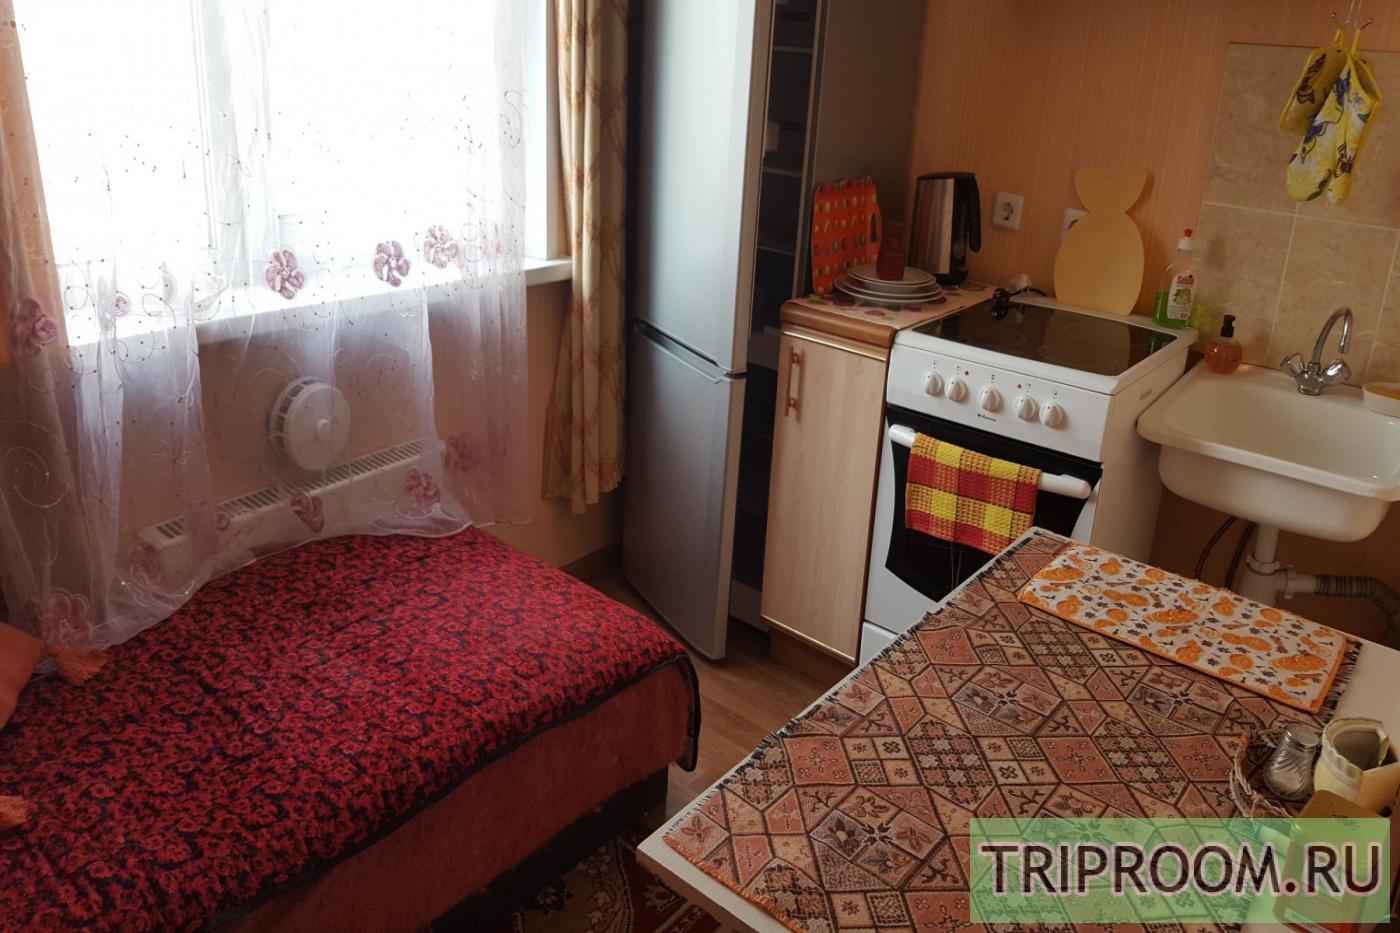 1-комнатная квартира посуточно (вариант № 30847), ул. Строителей улица, фото № 11